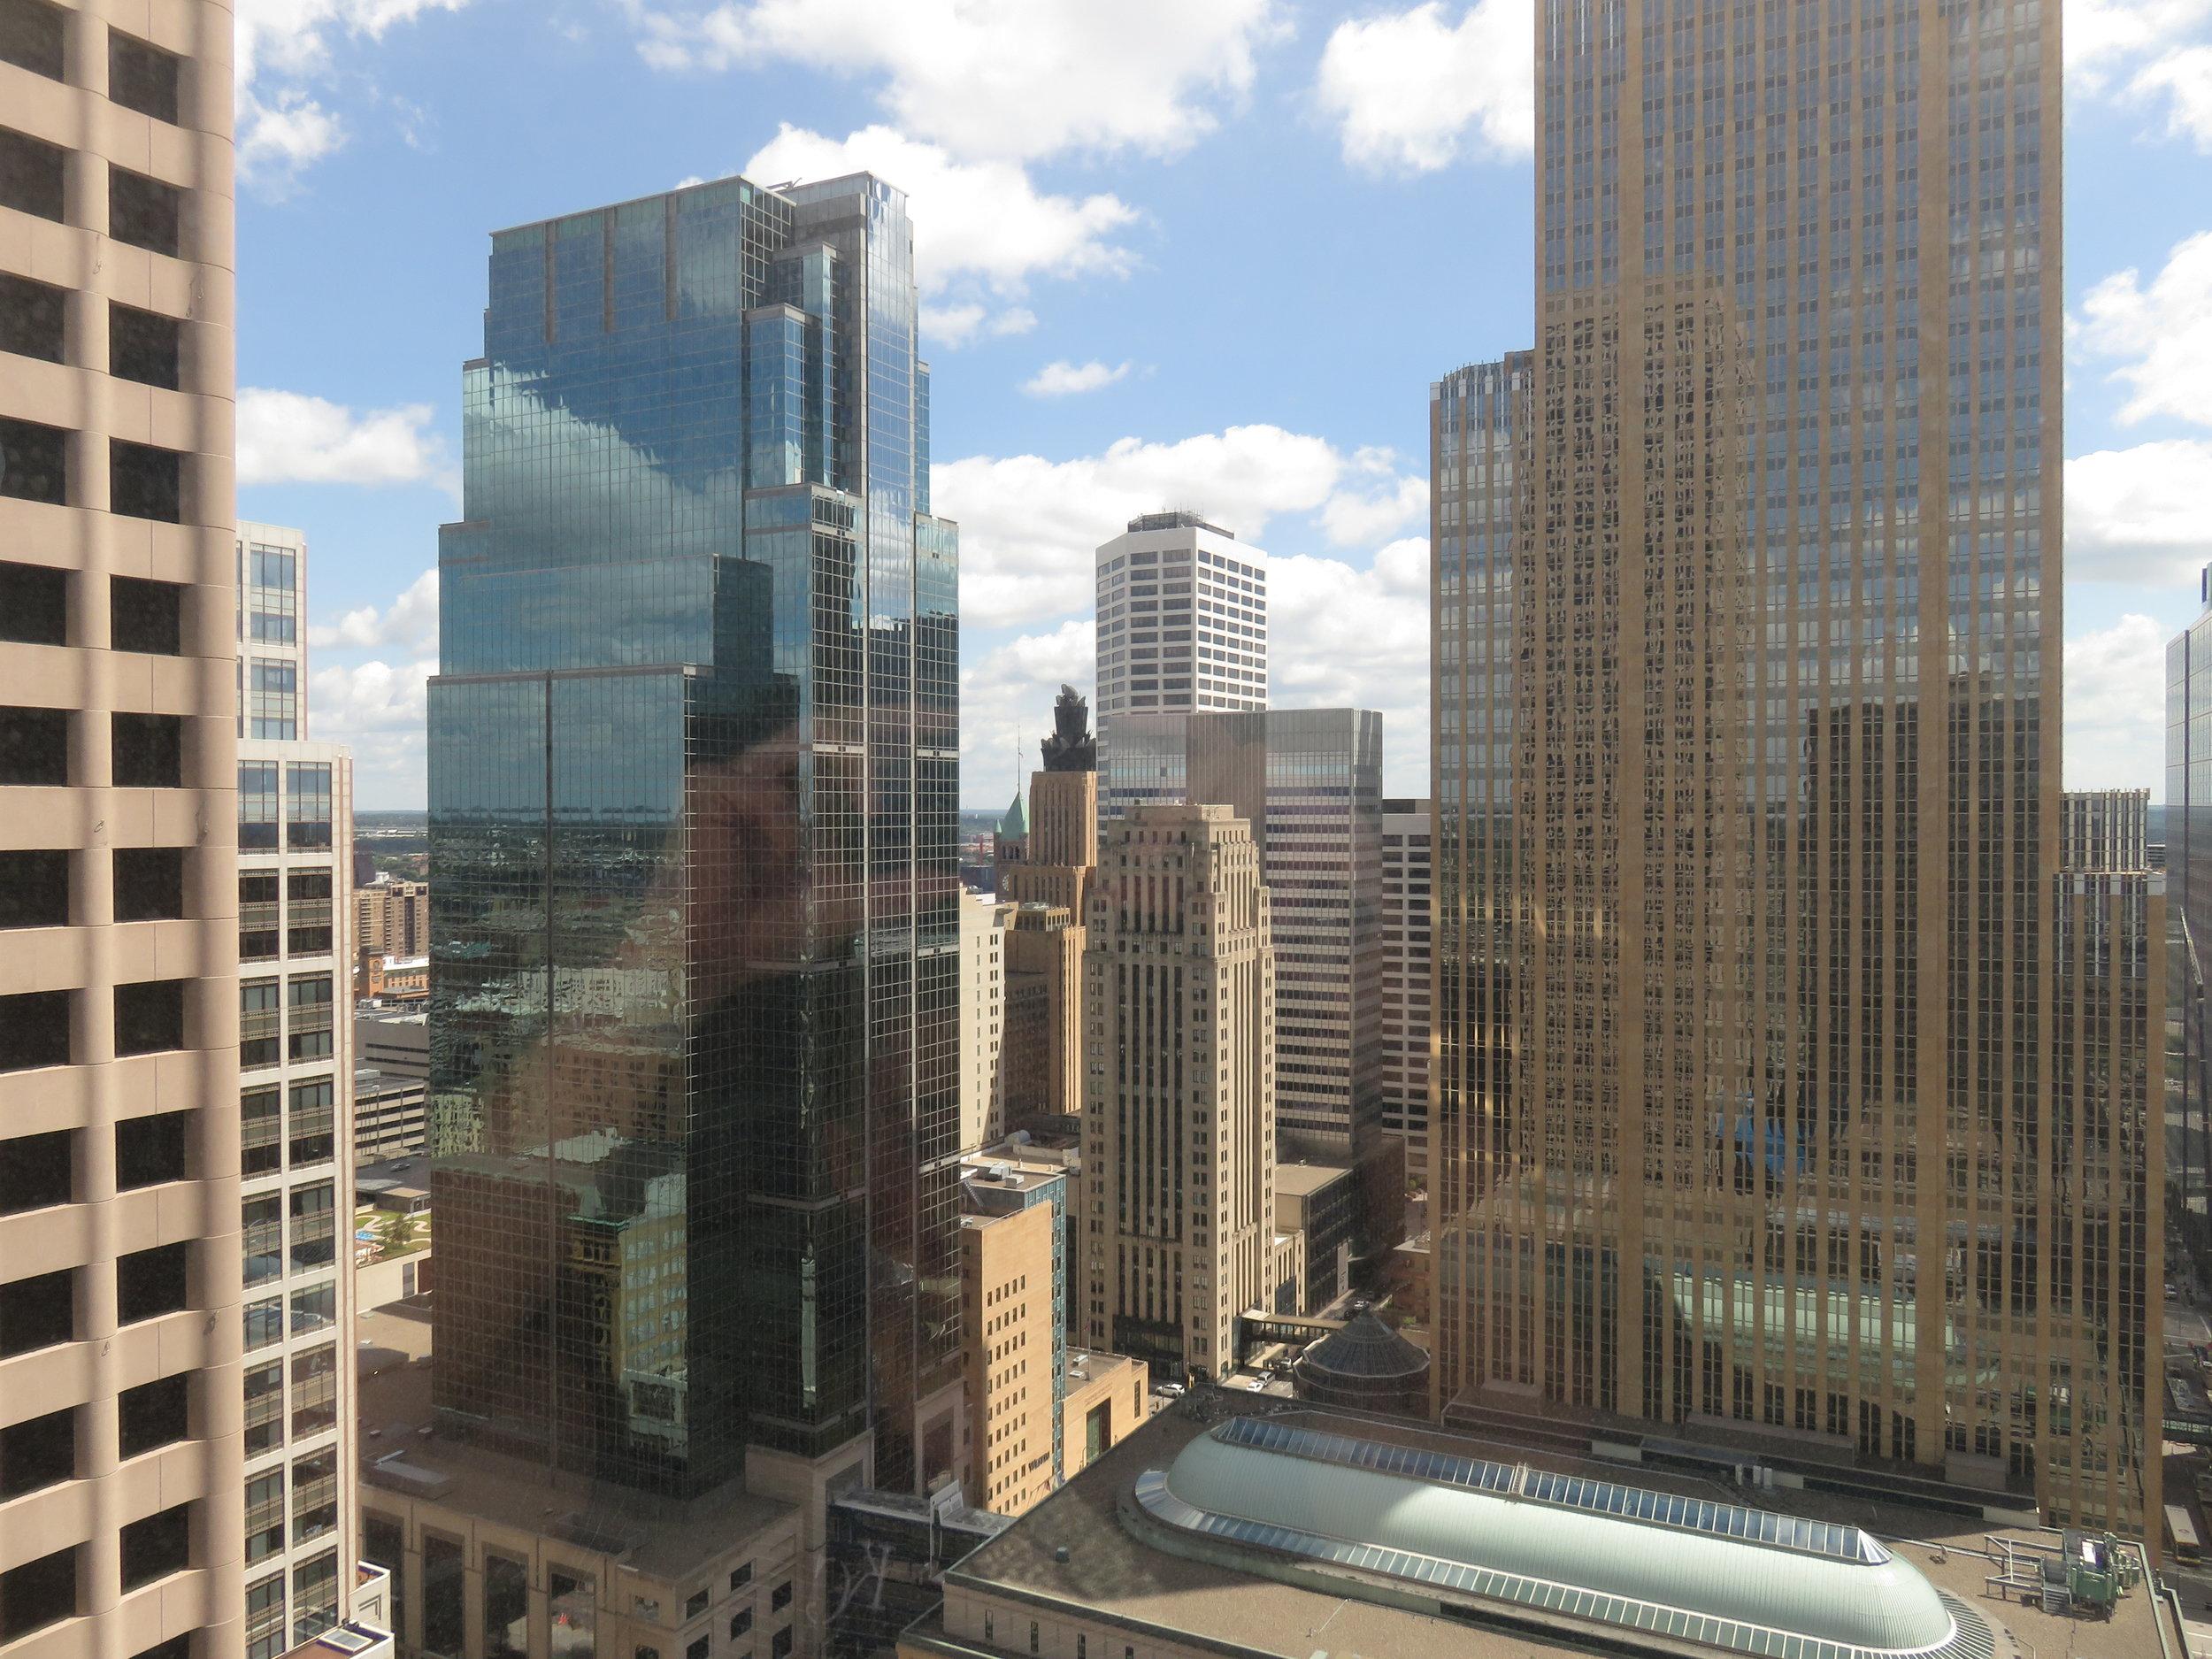 Minneapolis Marriott city view